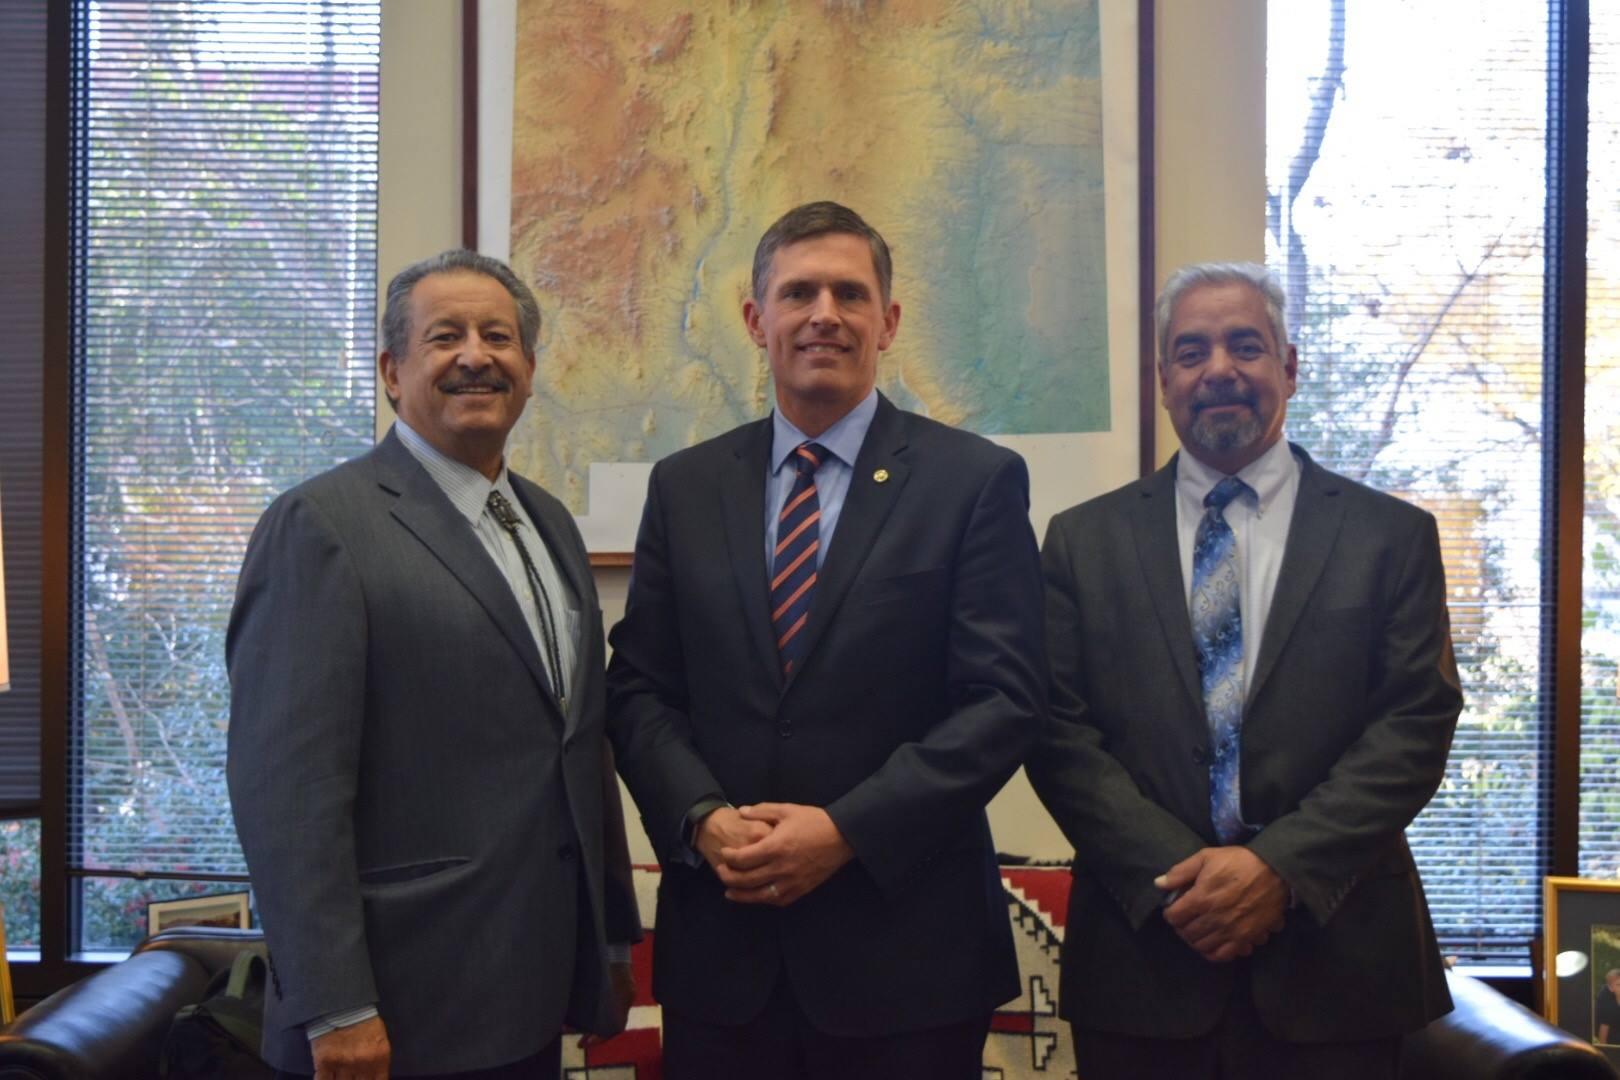 Kent Salazar, Senator Martin Heinrich of New Mexico, and Rock Ulibarri